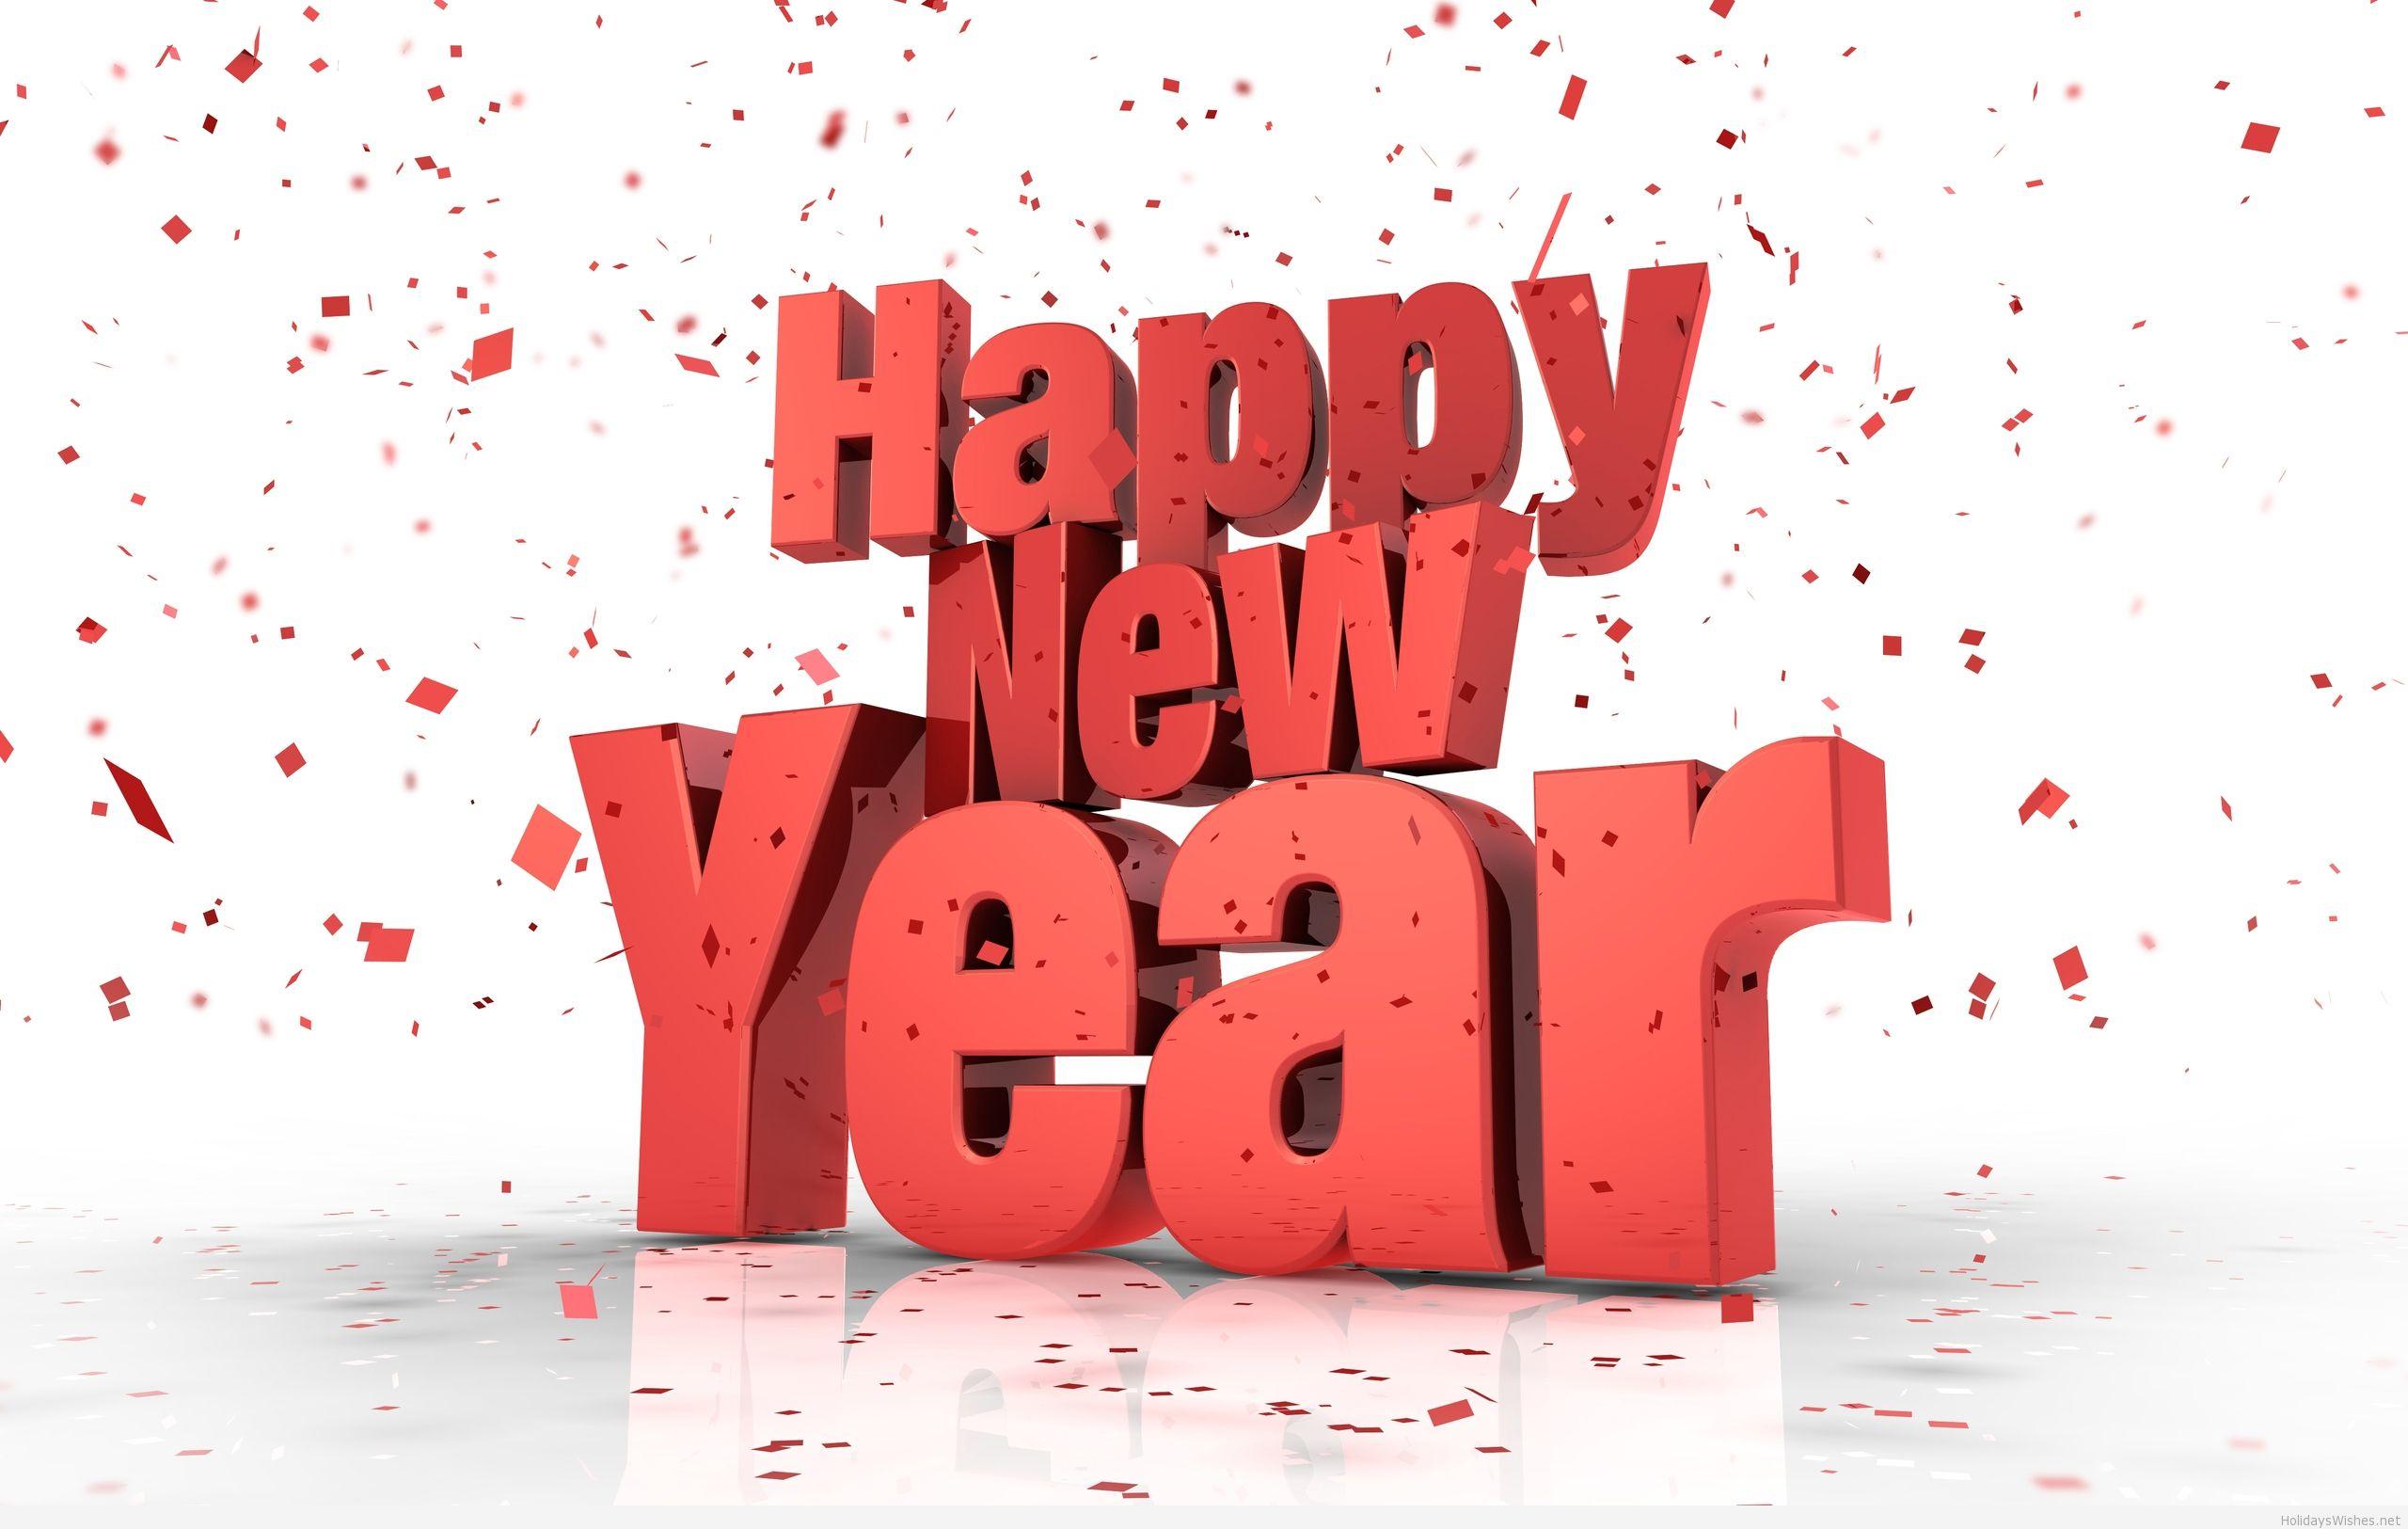 Happy new year 2015 3d wallpaper 2560x1625